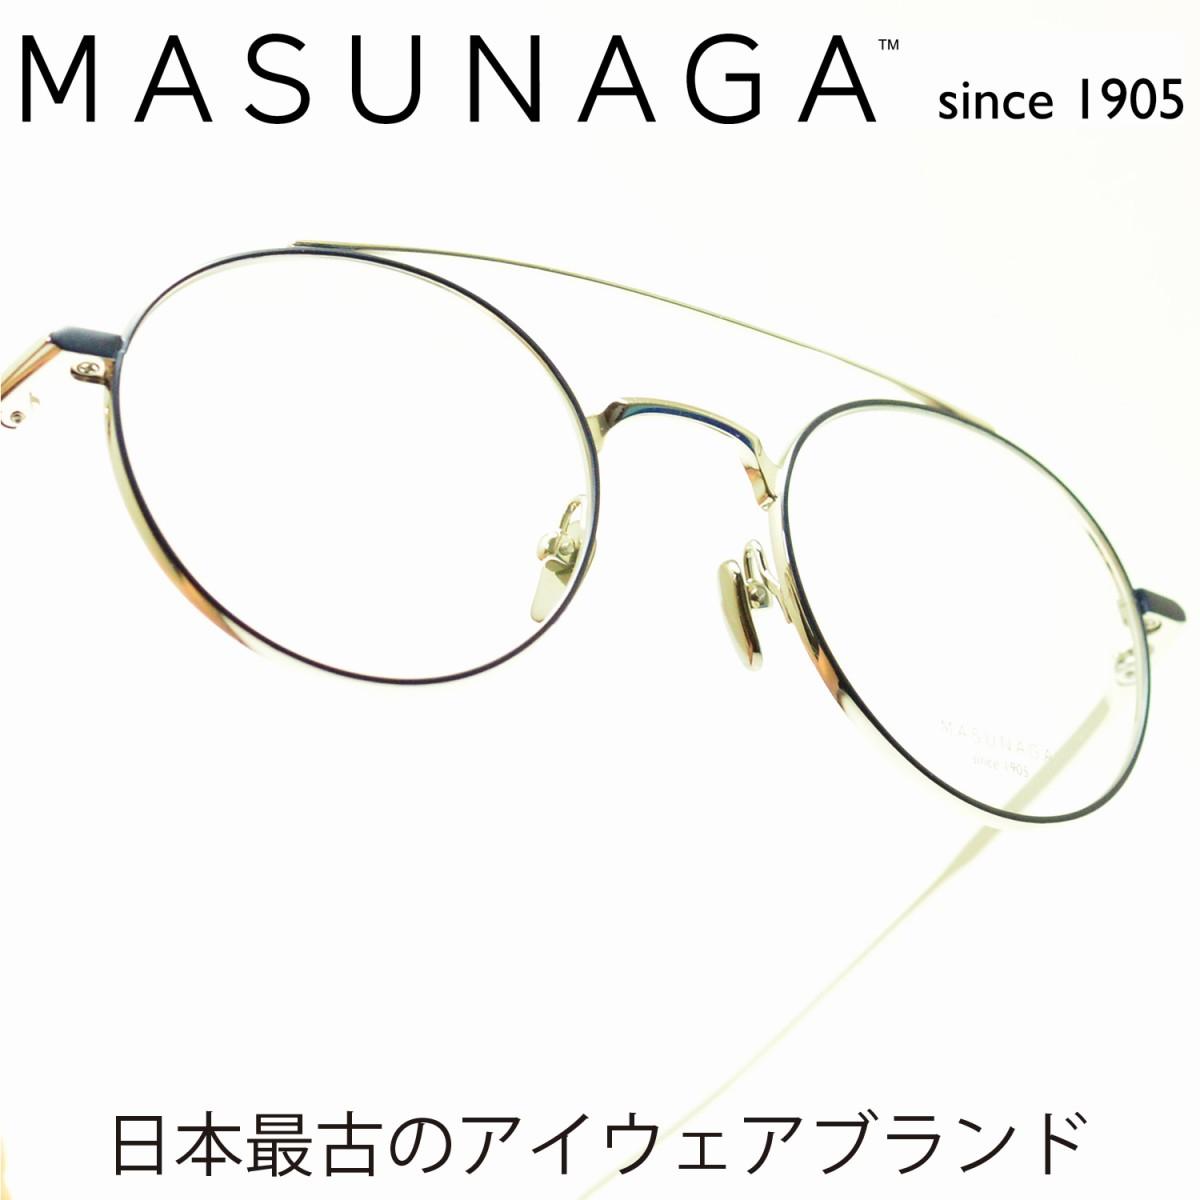 MASUNAGA Since1905 RHAPSODY COL-25メガネ 眼鏡 めがね メンズ レディース おしゃれ ブランド 人気 おすすめ フレーム 流行り 度付き レンズ